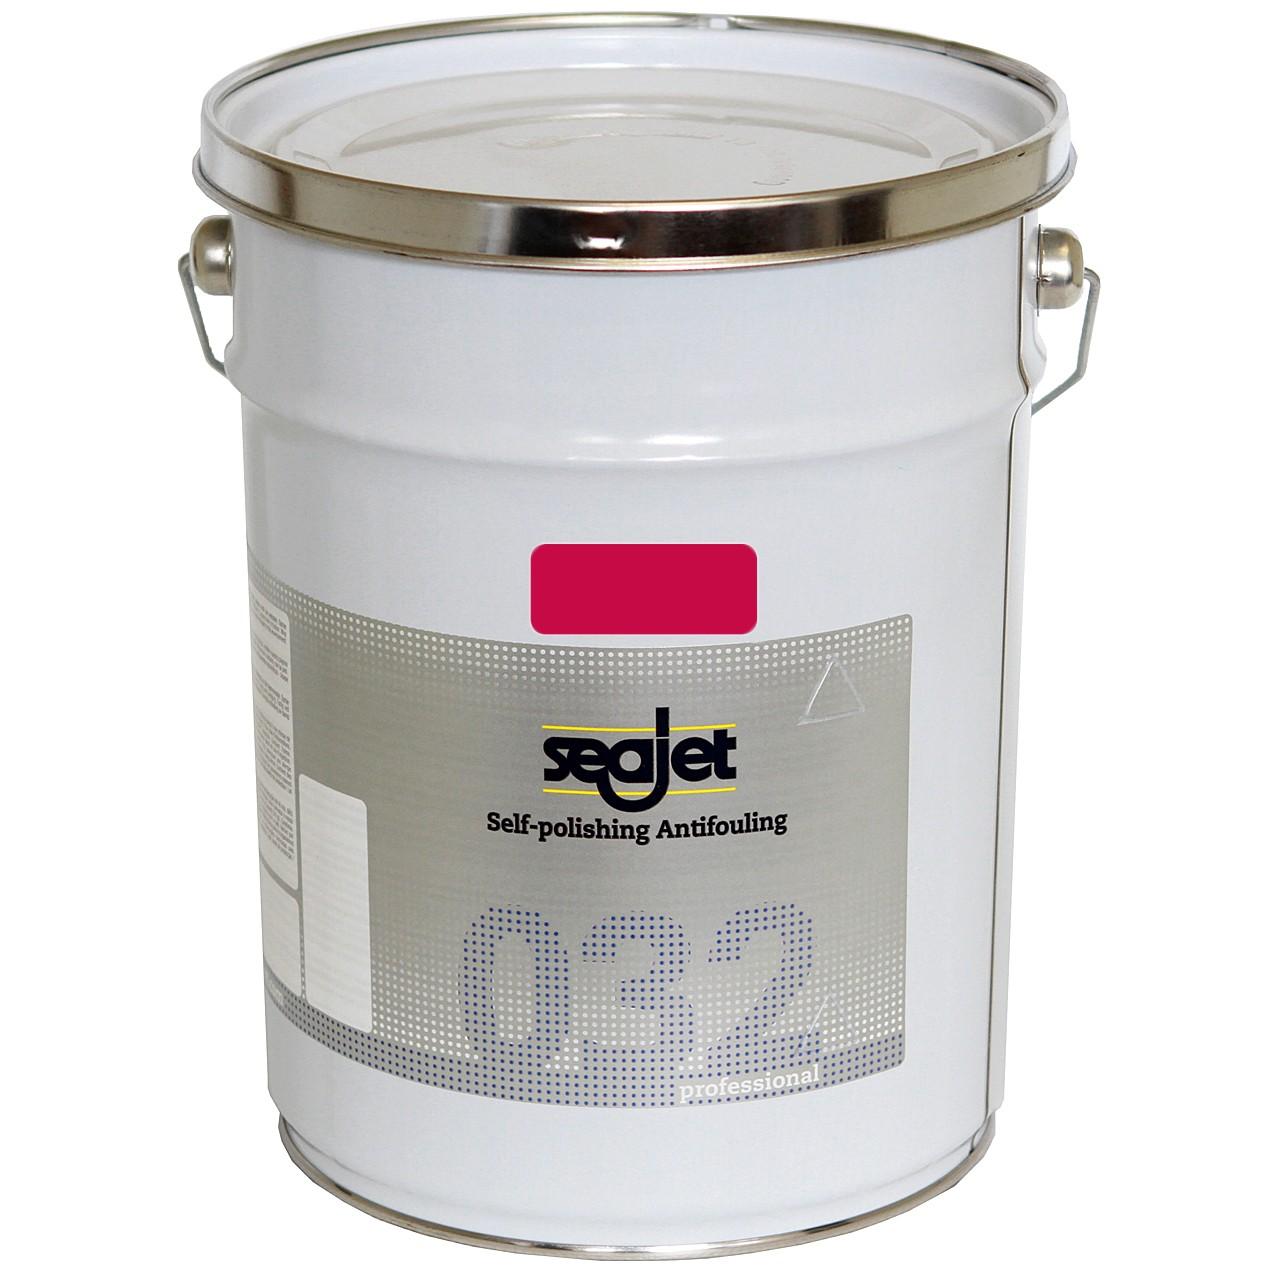 Seajet 032 professional antifouling 3 5 liter for Decor 5 5 litre